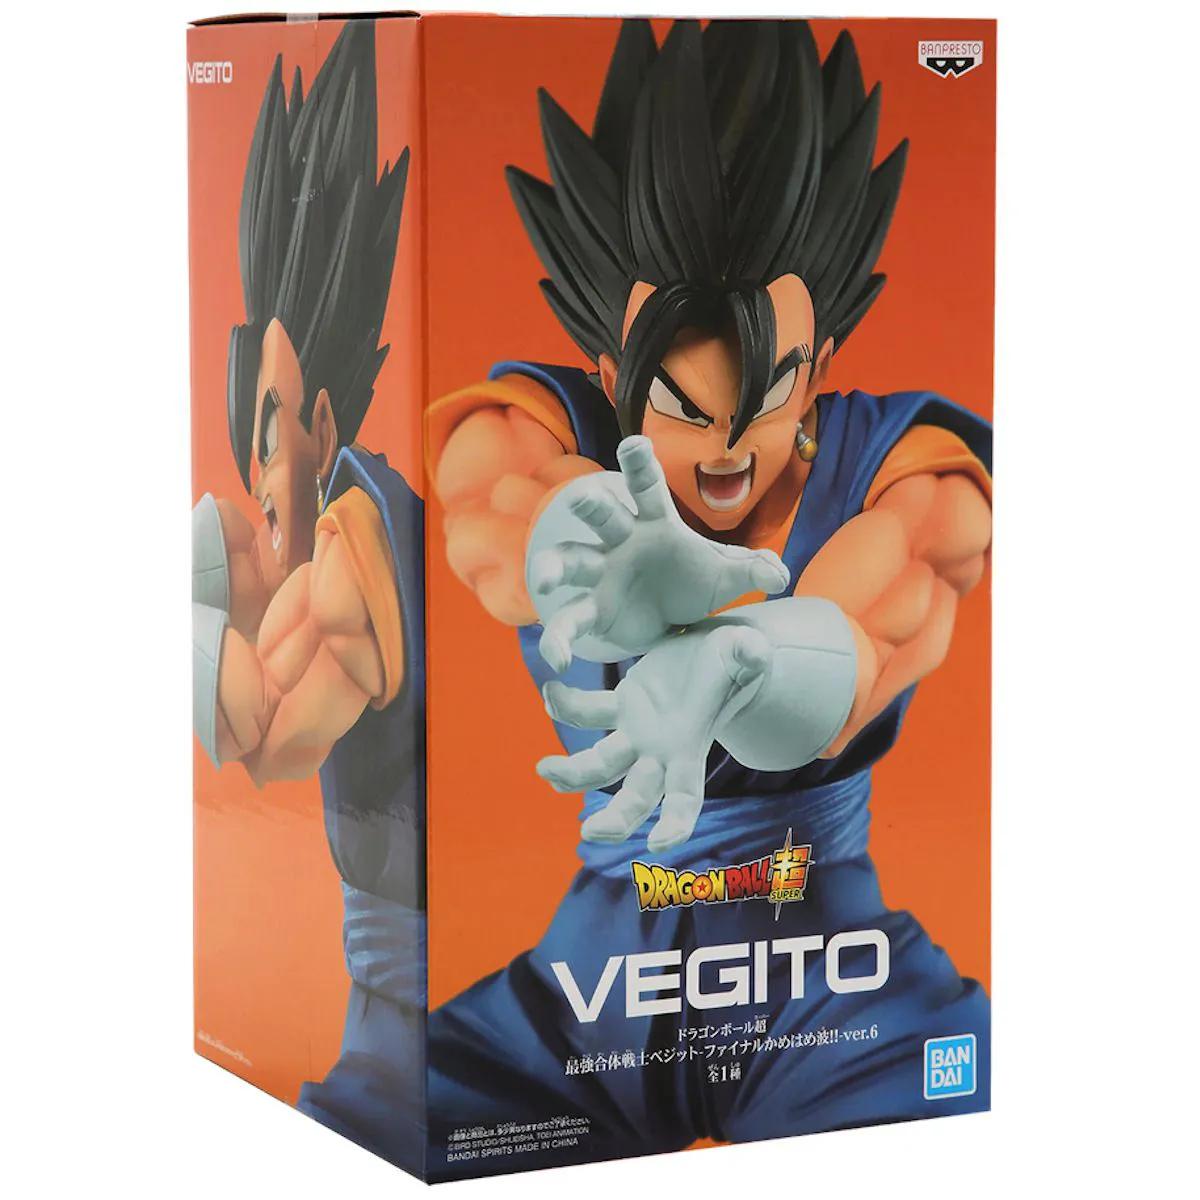 Dragon Ball Super - Vegetto -  Final Kamehameha Ver 6 - Bandai Banpresto